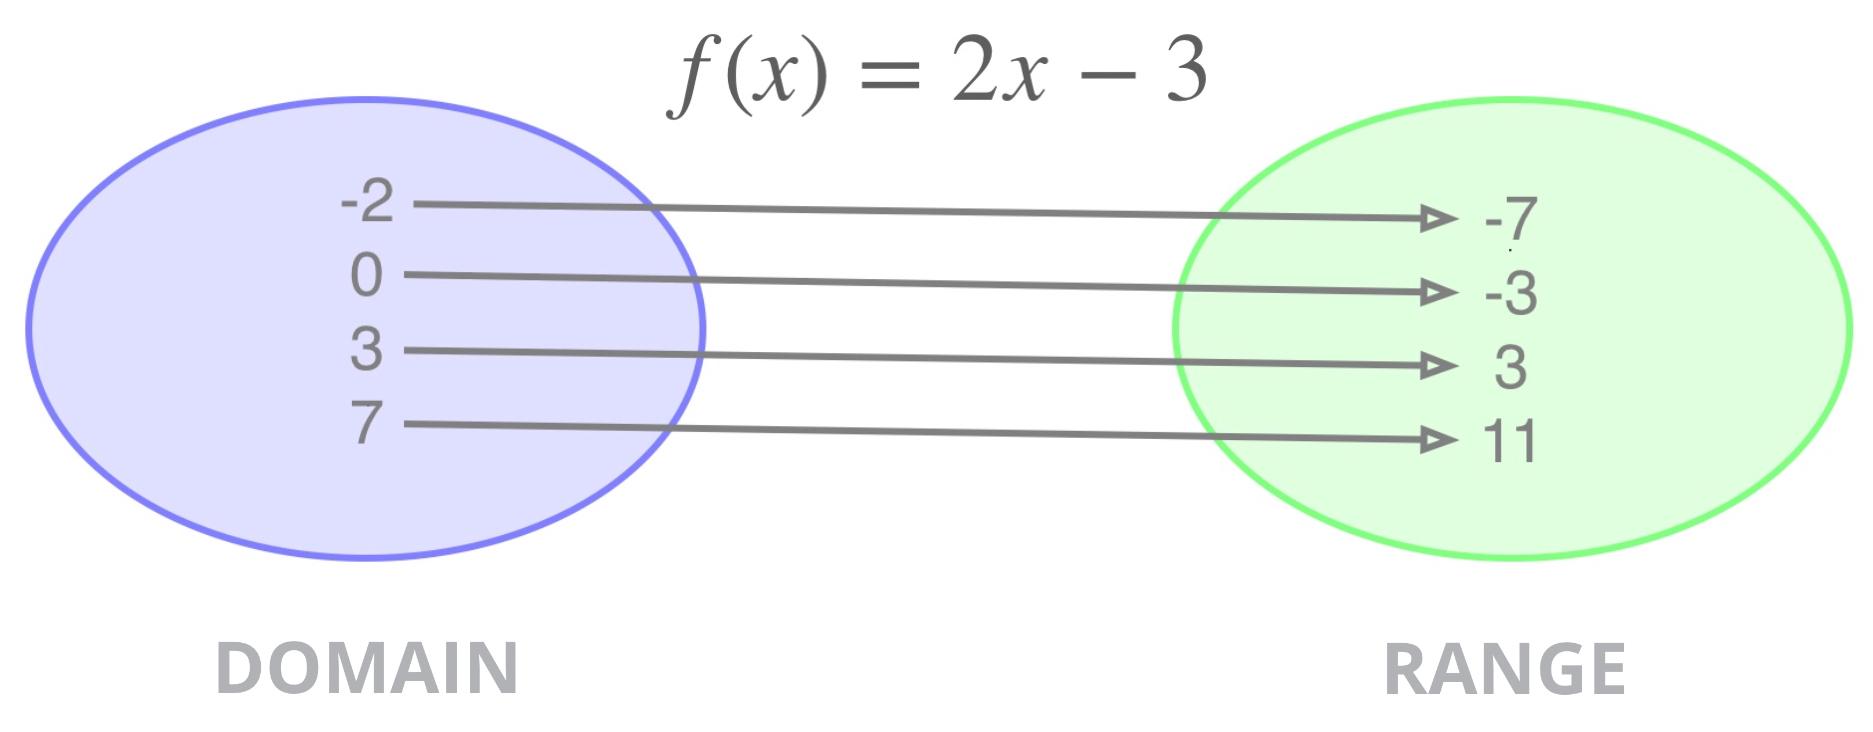 Domain Range A Function